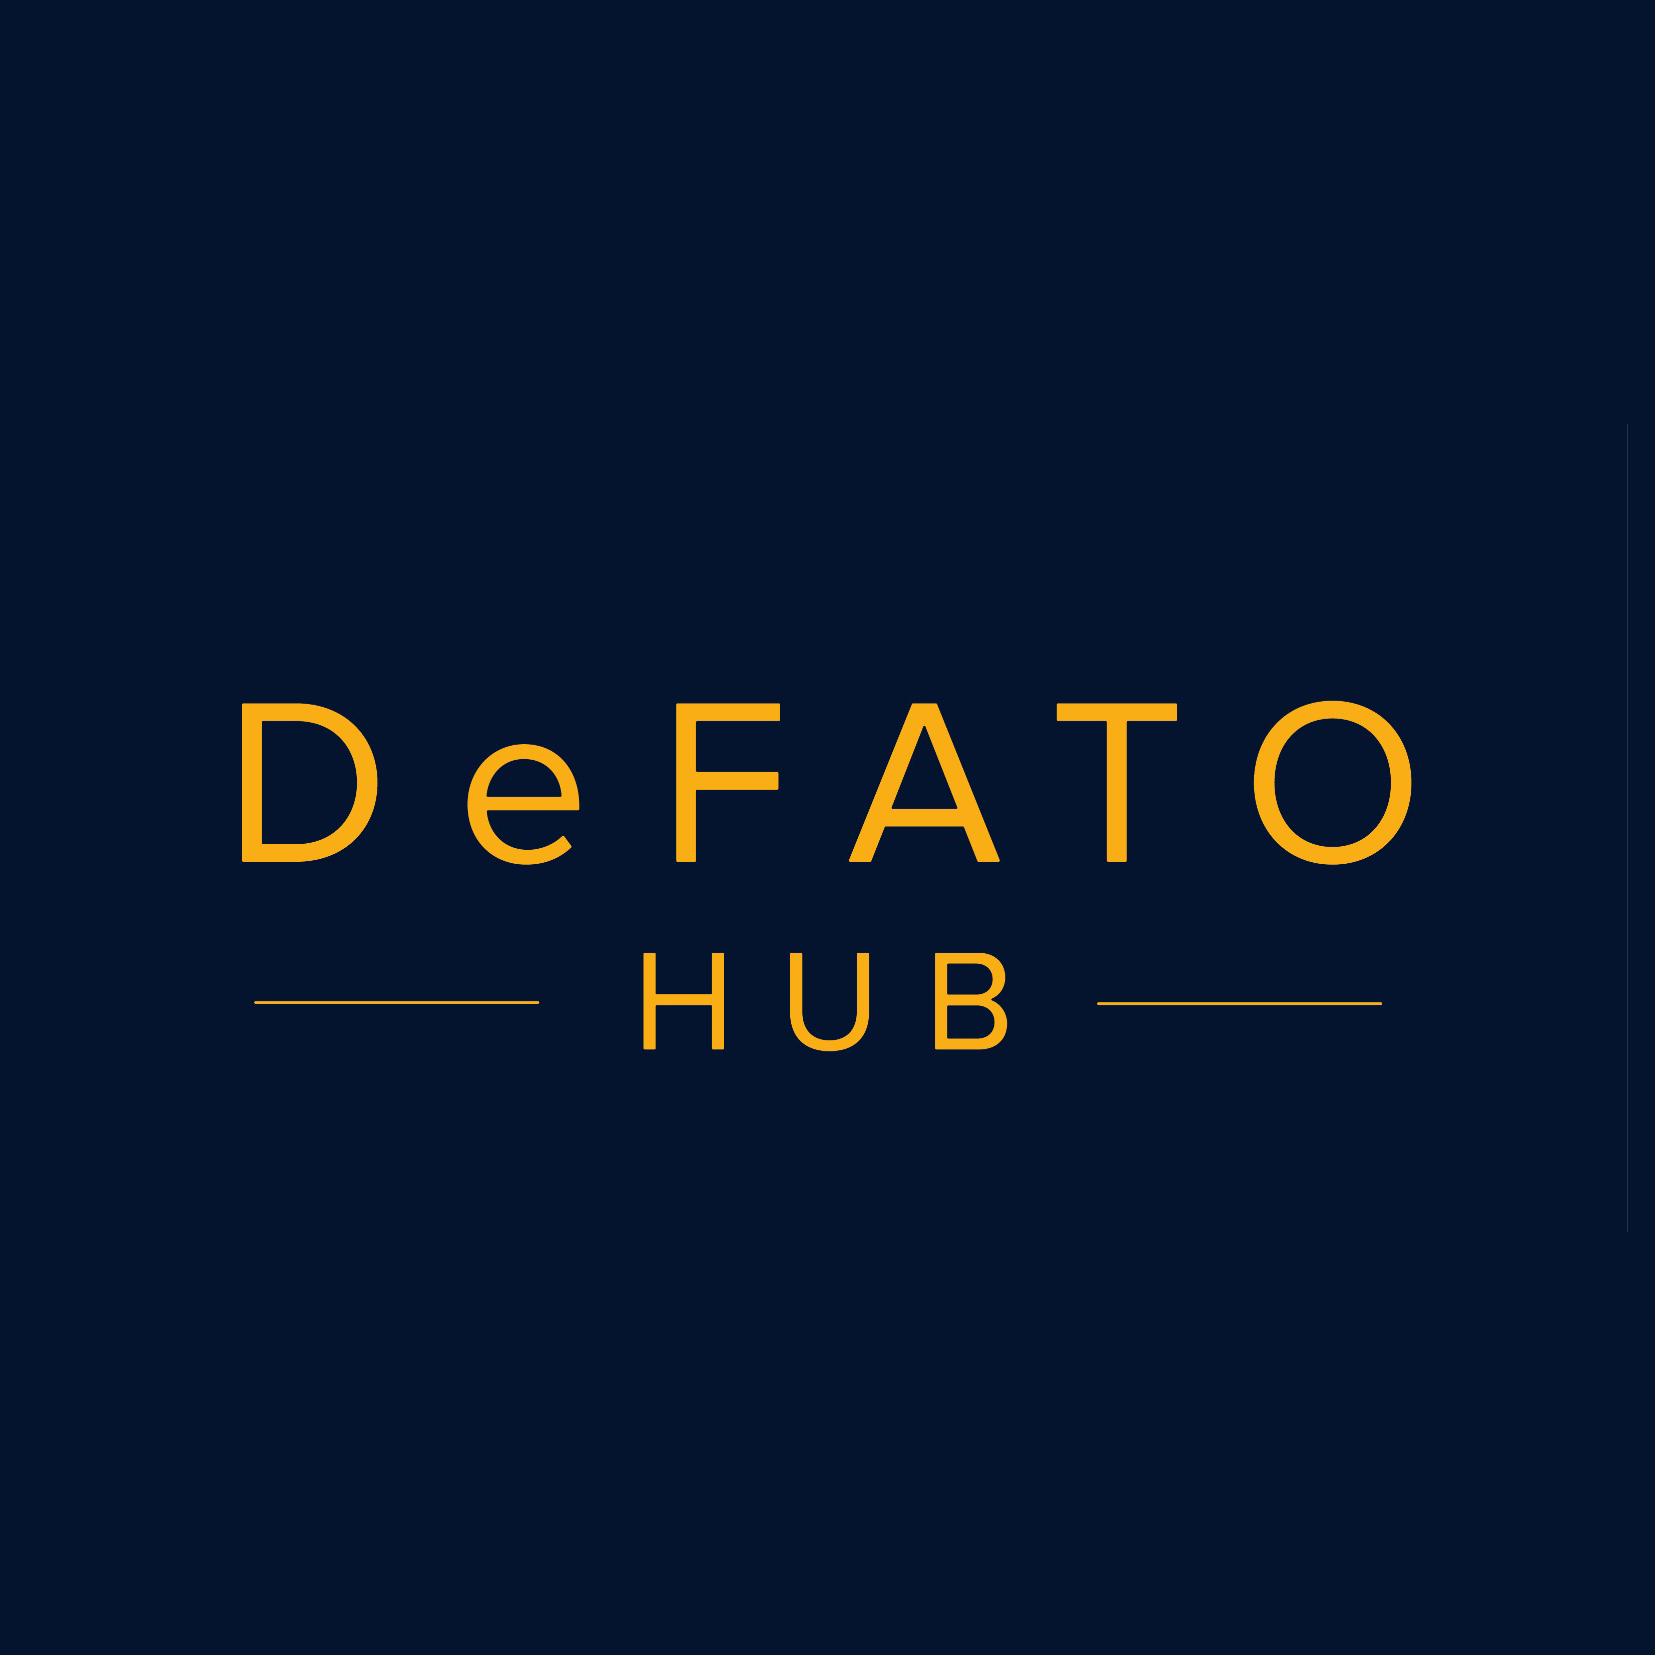 DeFATO Hub Team